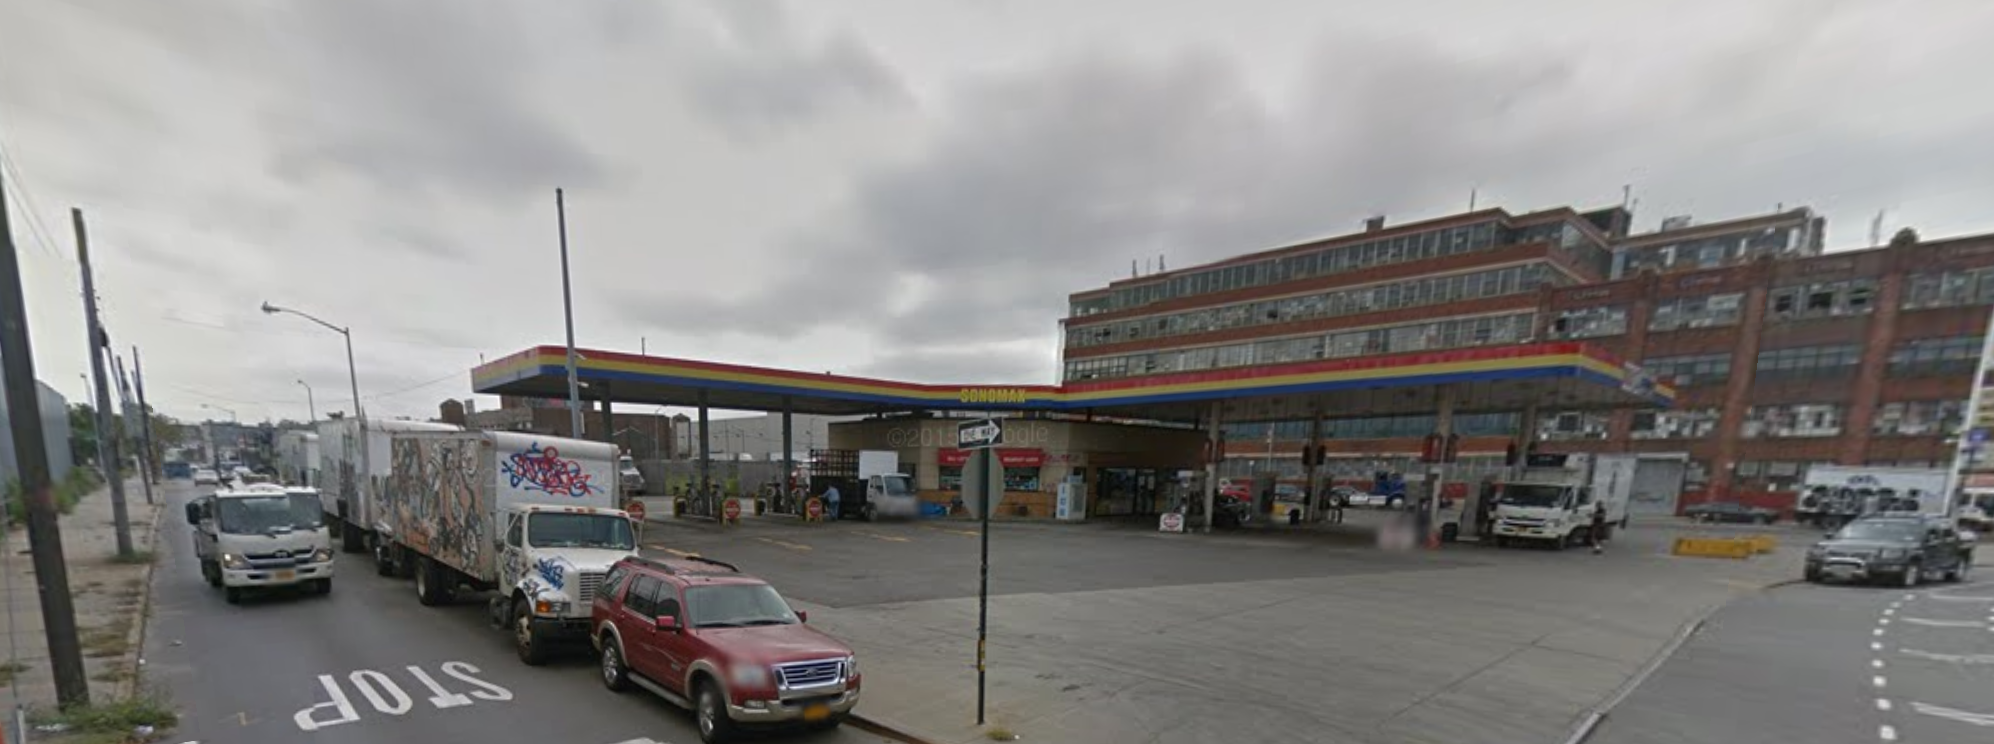 305 Calyer Street, image via Google Maps